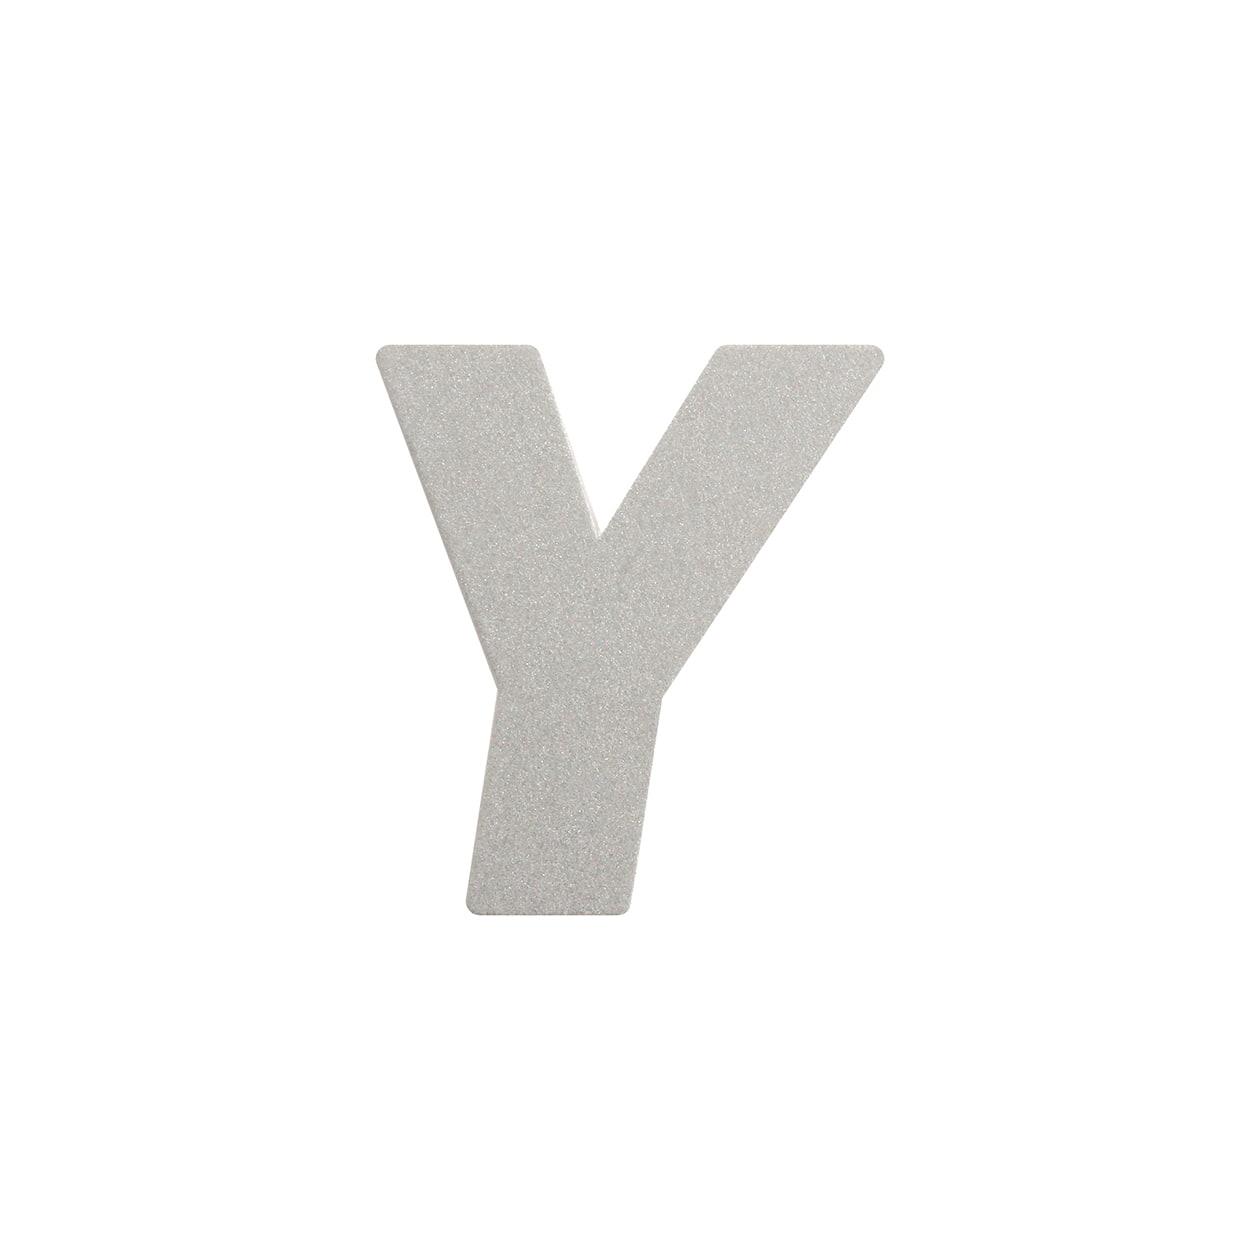 No.395ボード A7カードDC 文字Y シルバー